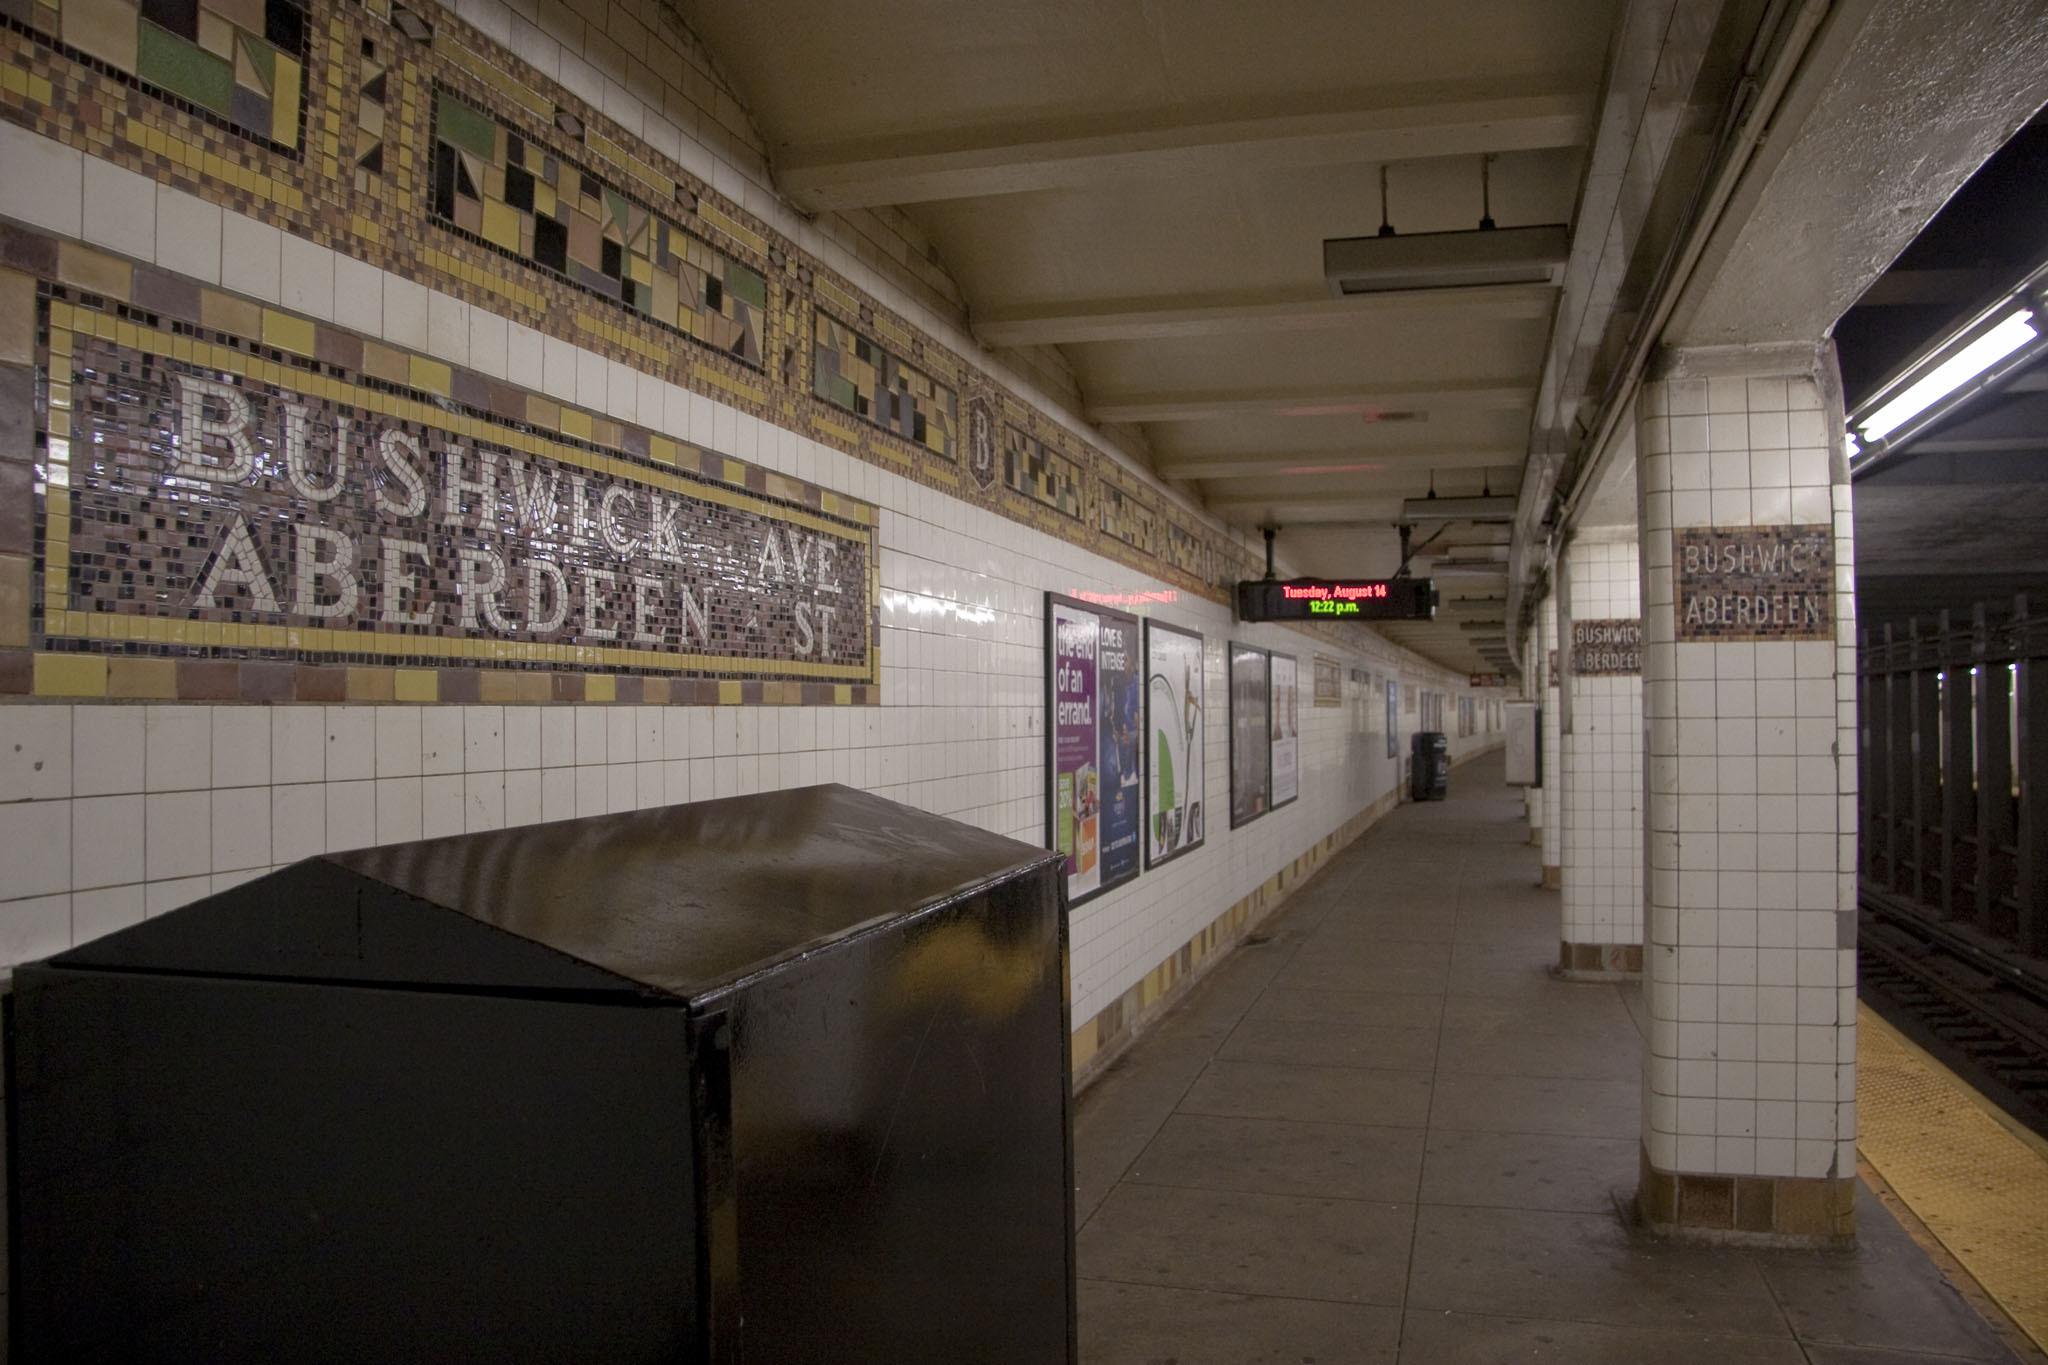 Subways in summer: Is it hotter or cooler belowground?